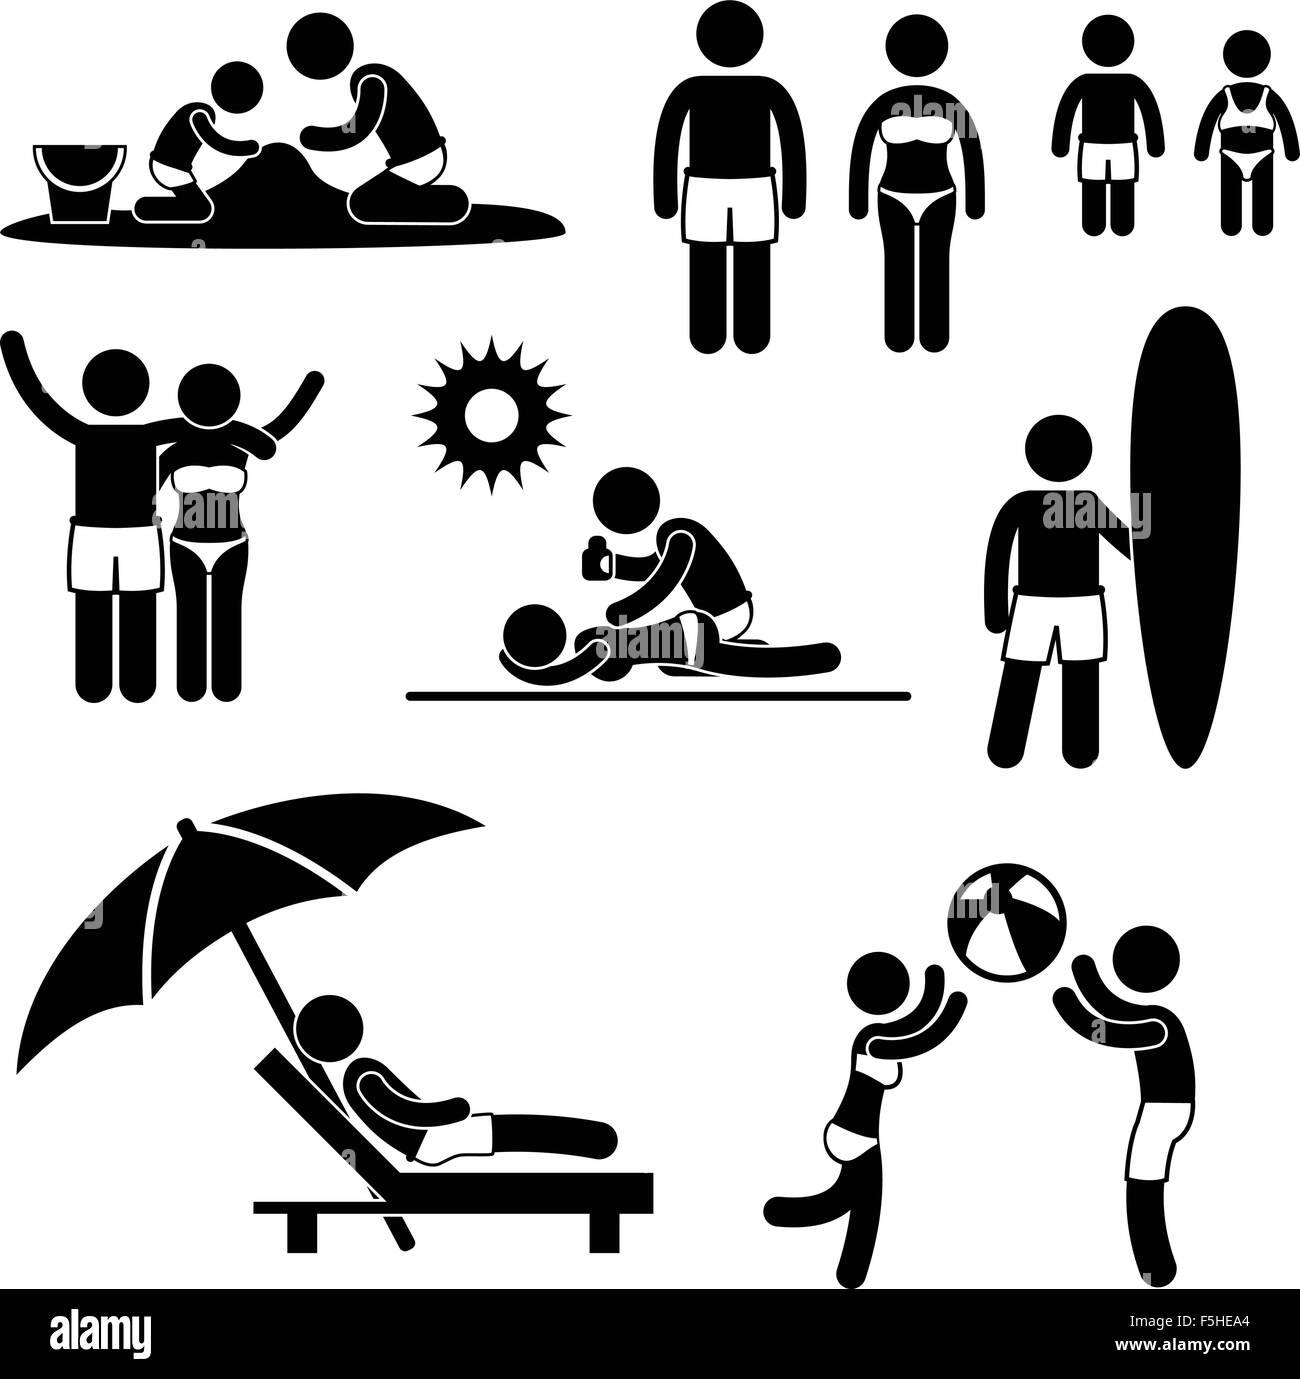 Atemberaubend Symbol Summer Ideen - Schaltplan Serie Circuit ...